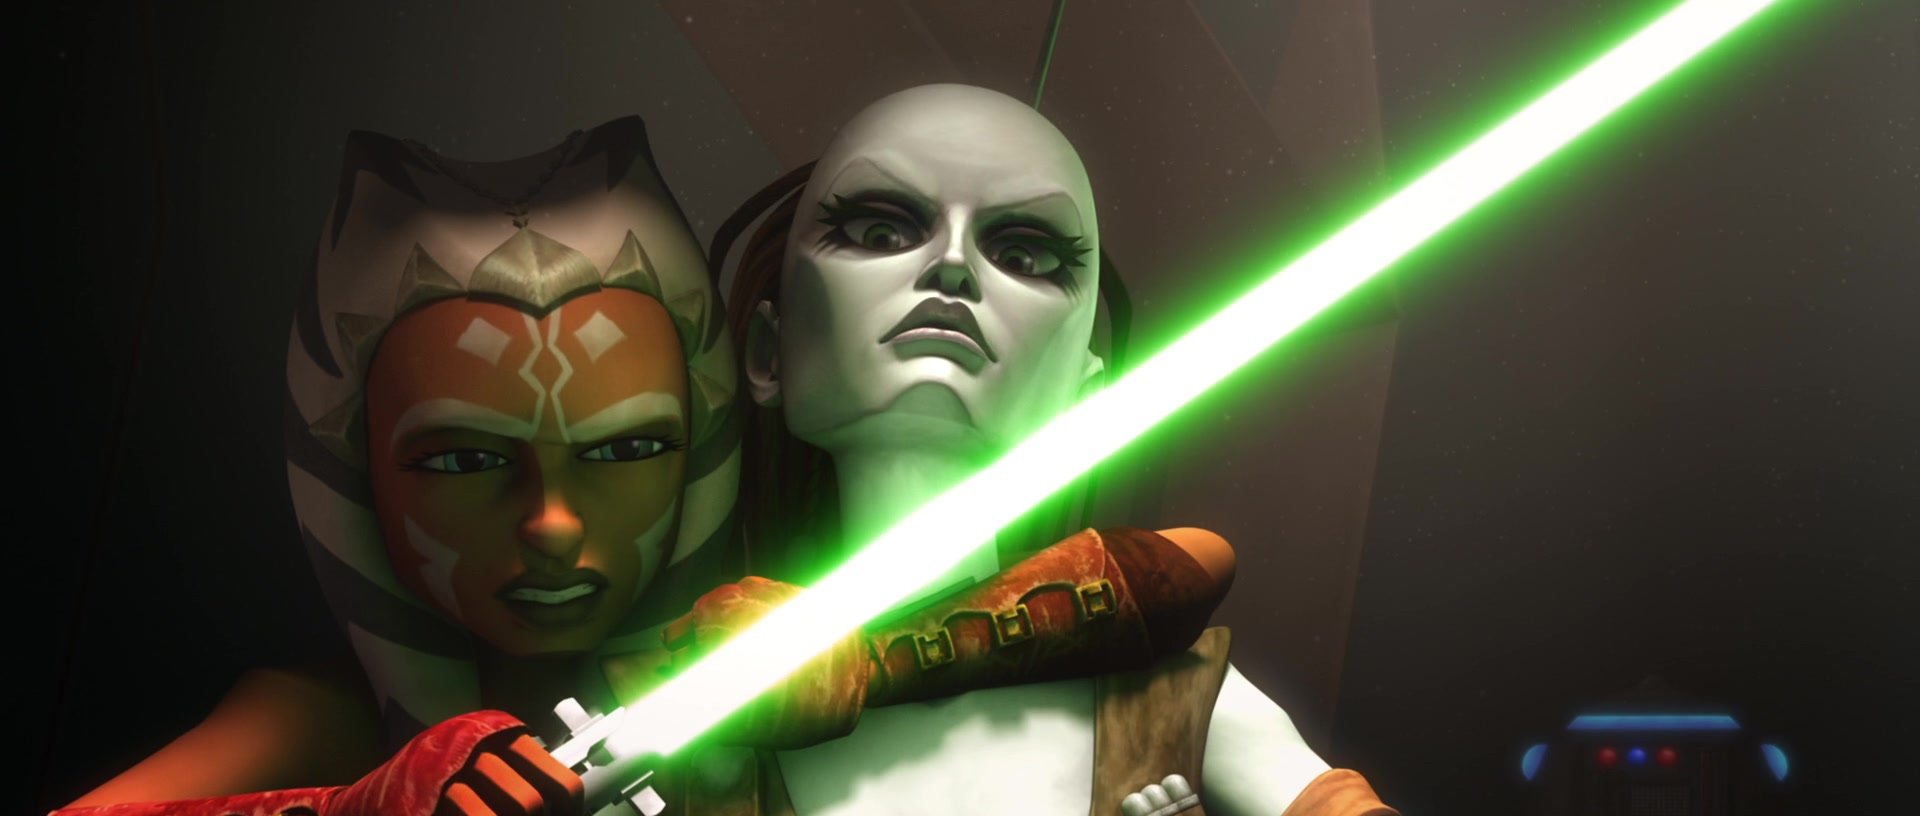 star wars series the clone wars s2e22 lethal trackdown ahsoka tano aurra sing